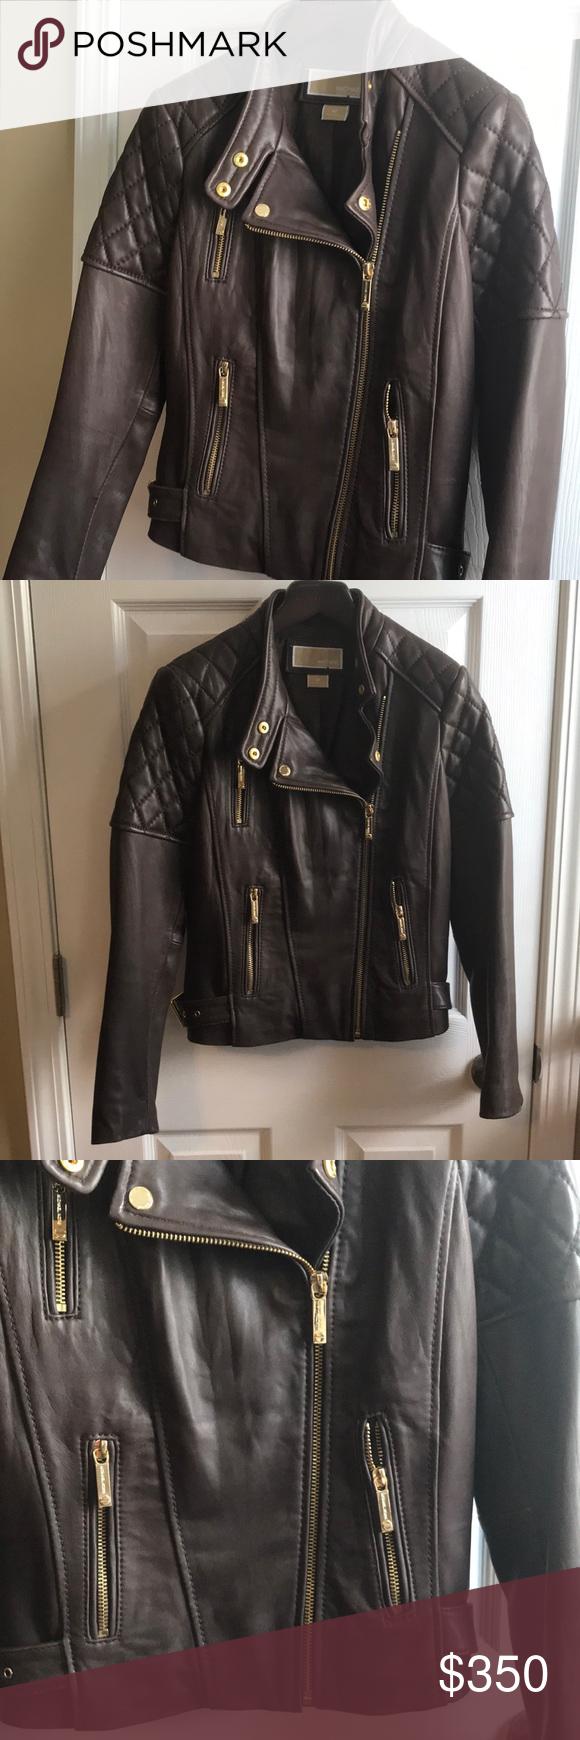 Michael Kors Leather Jacket Leather Jacket Michael Kors Michael Kors Jackets [ 1740 x 580 Pixel ]